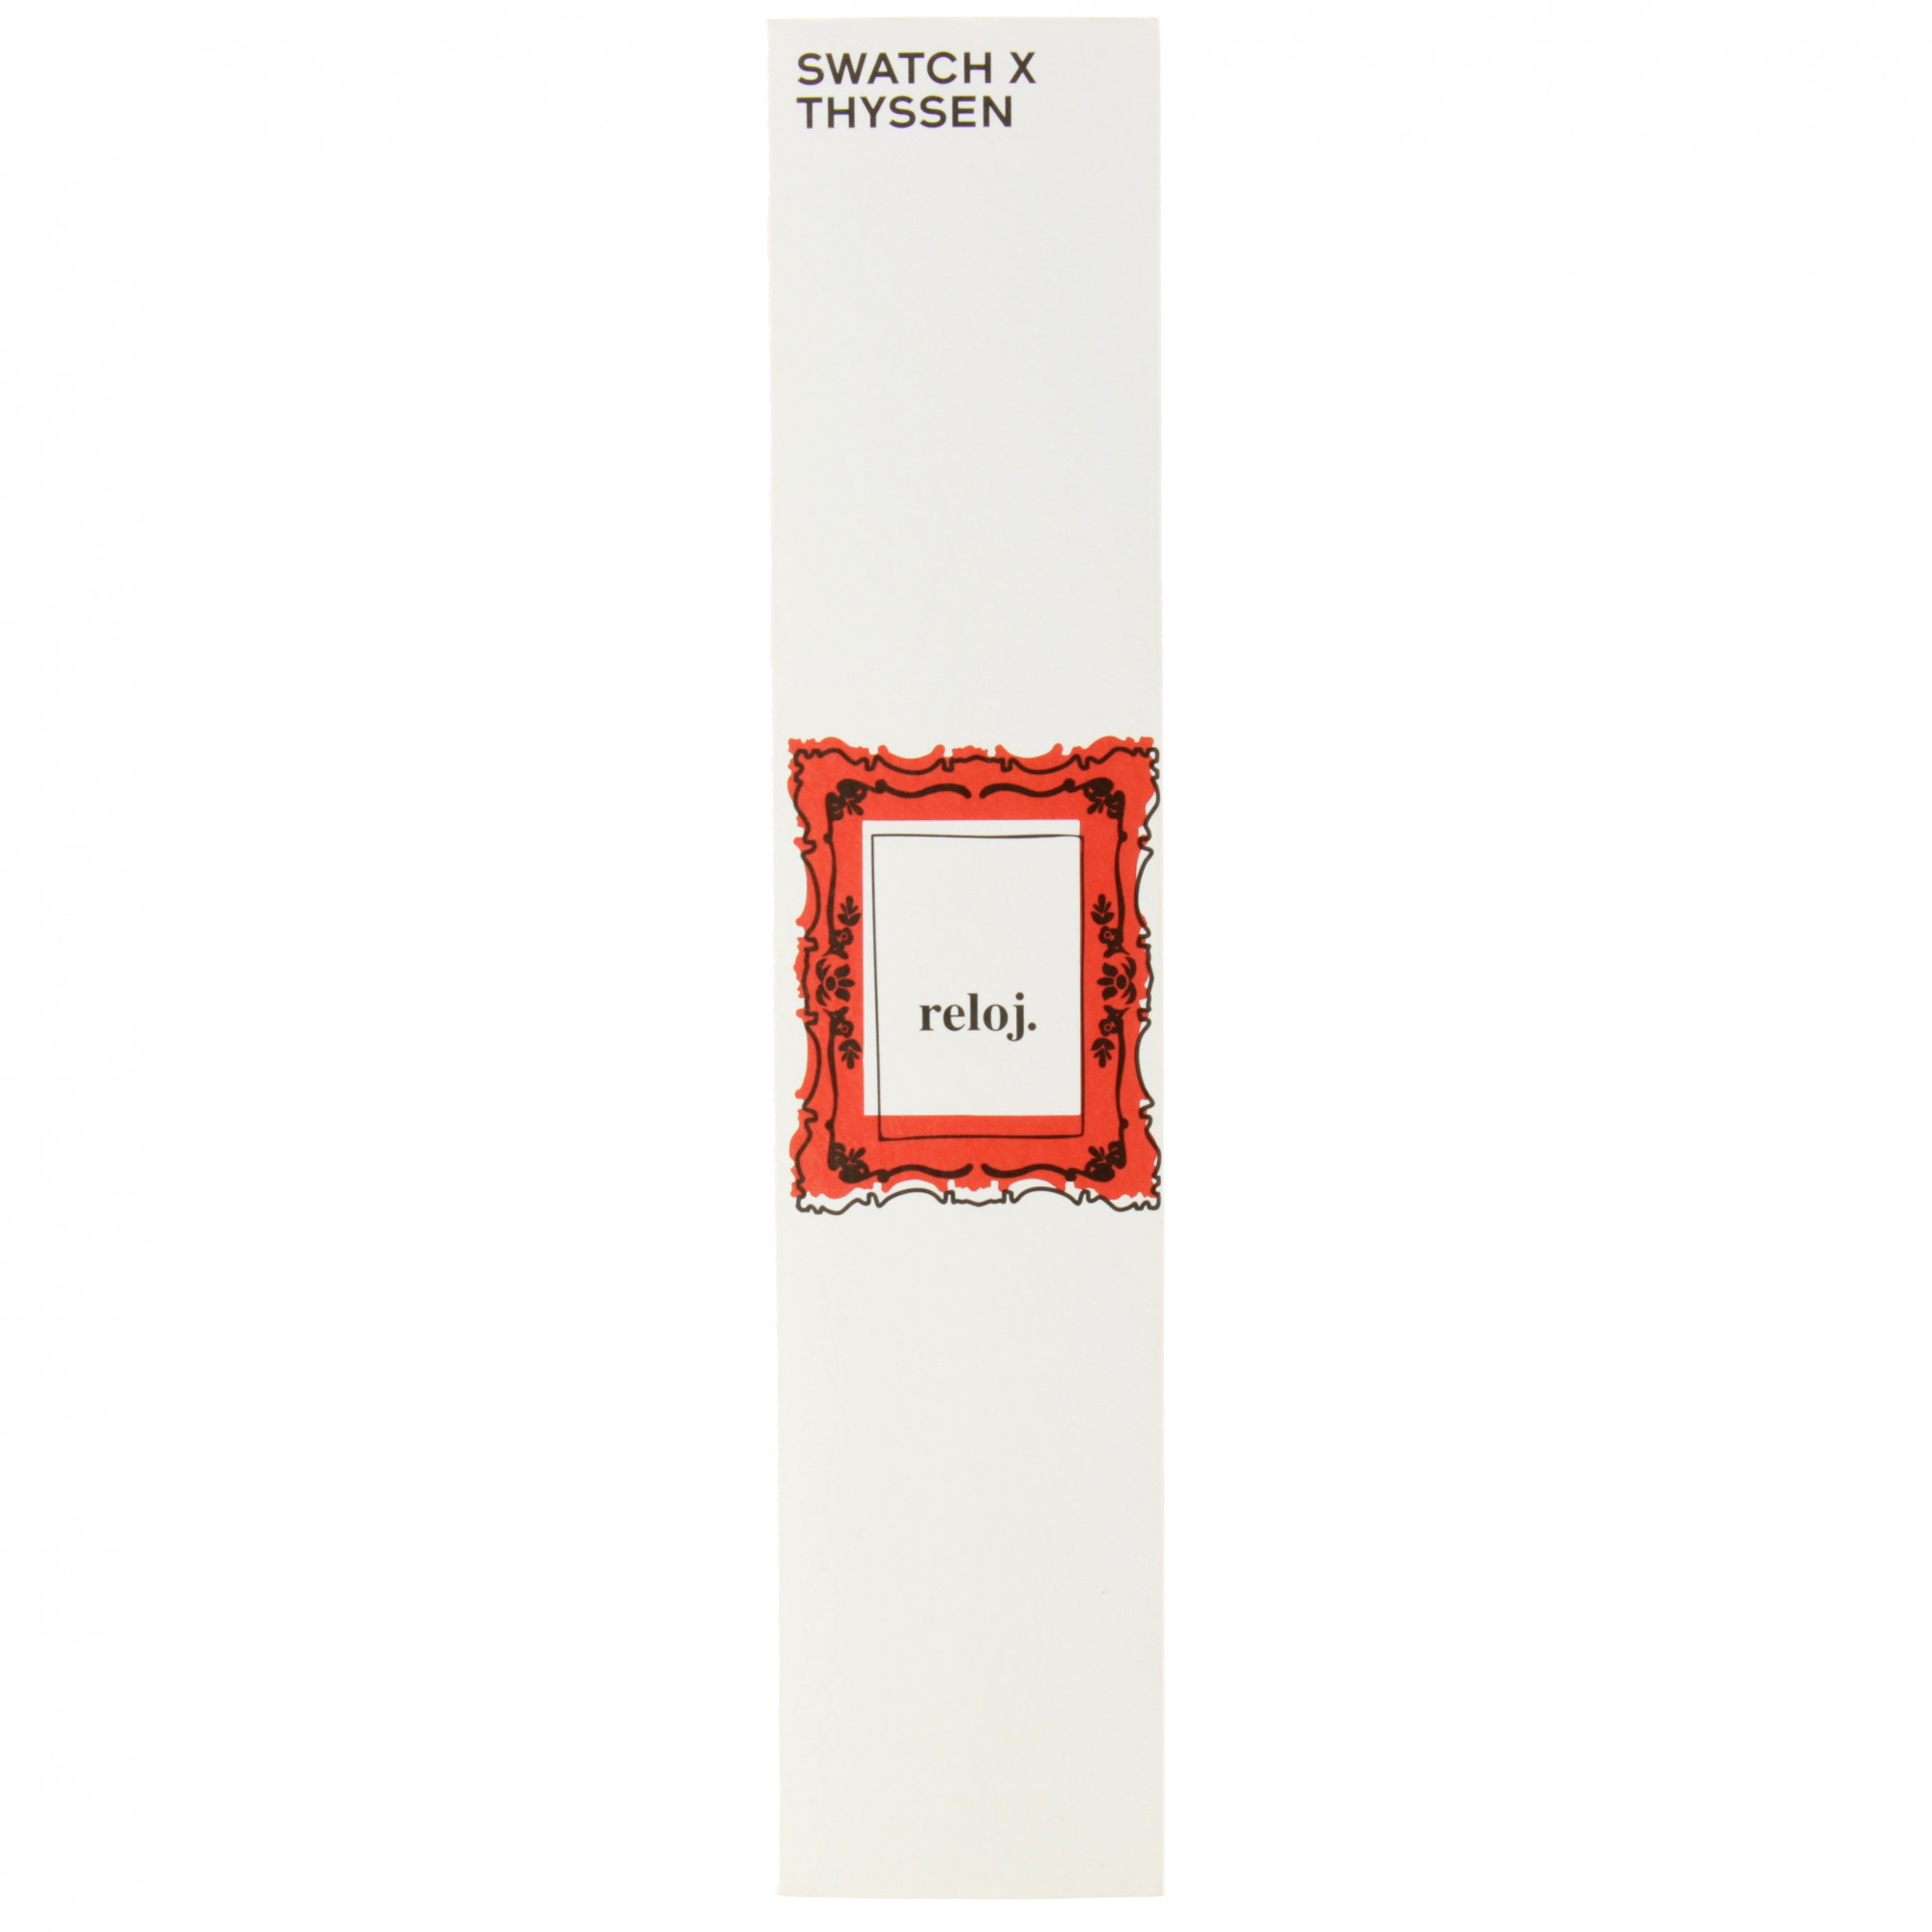 zoom Reloj Swatch+Thyssen Mondrian The Red Shiny Line